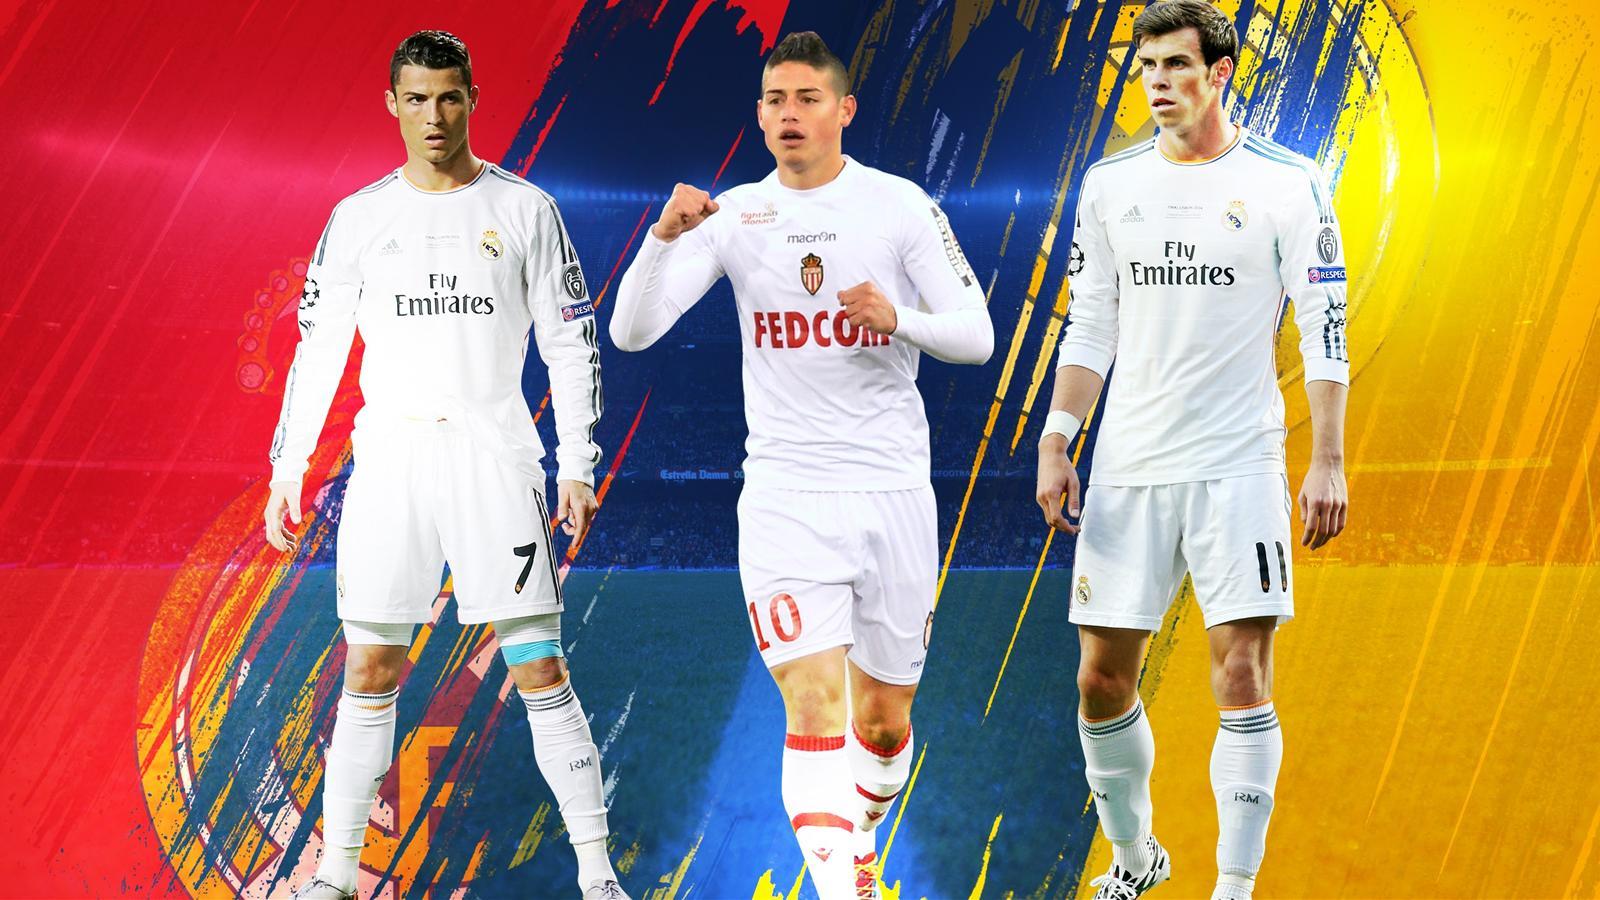 Cristiano Ronaldo, James Rodriguez et Gareth Bale joueront ensemble au Real Madrid